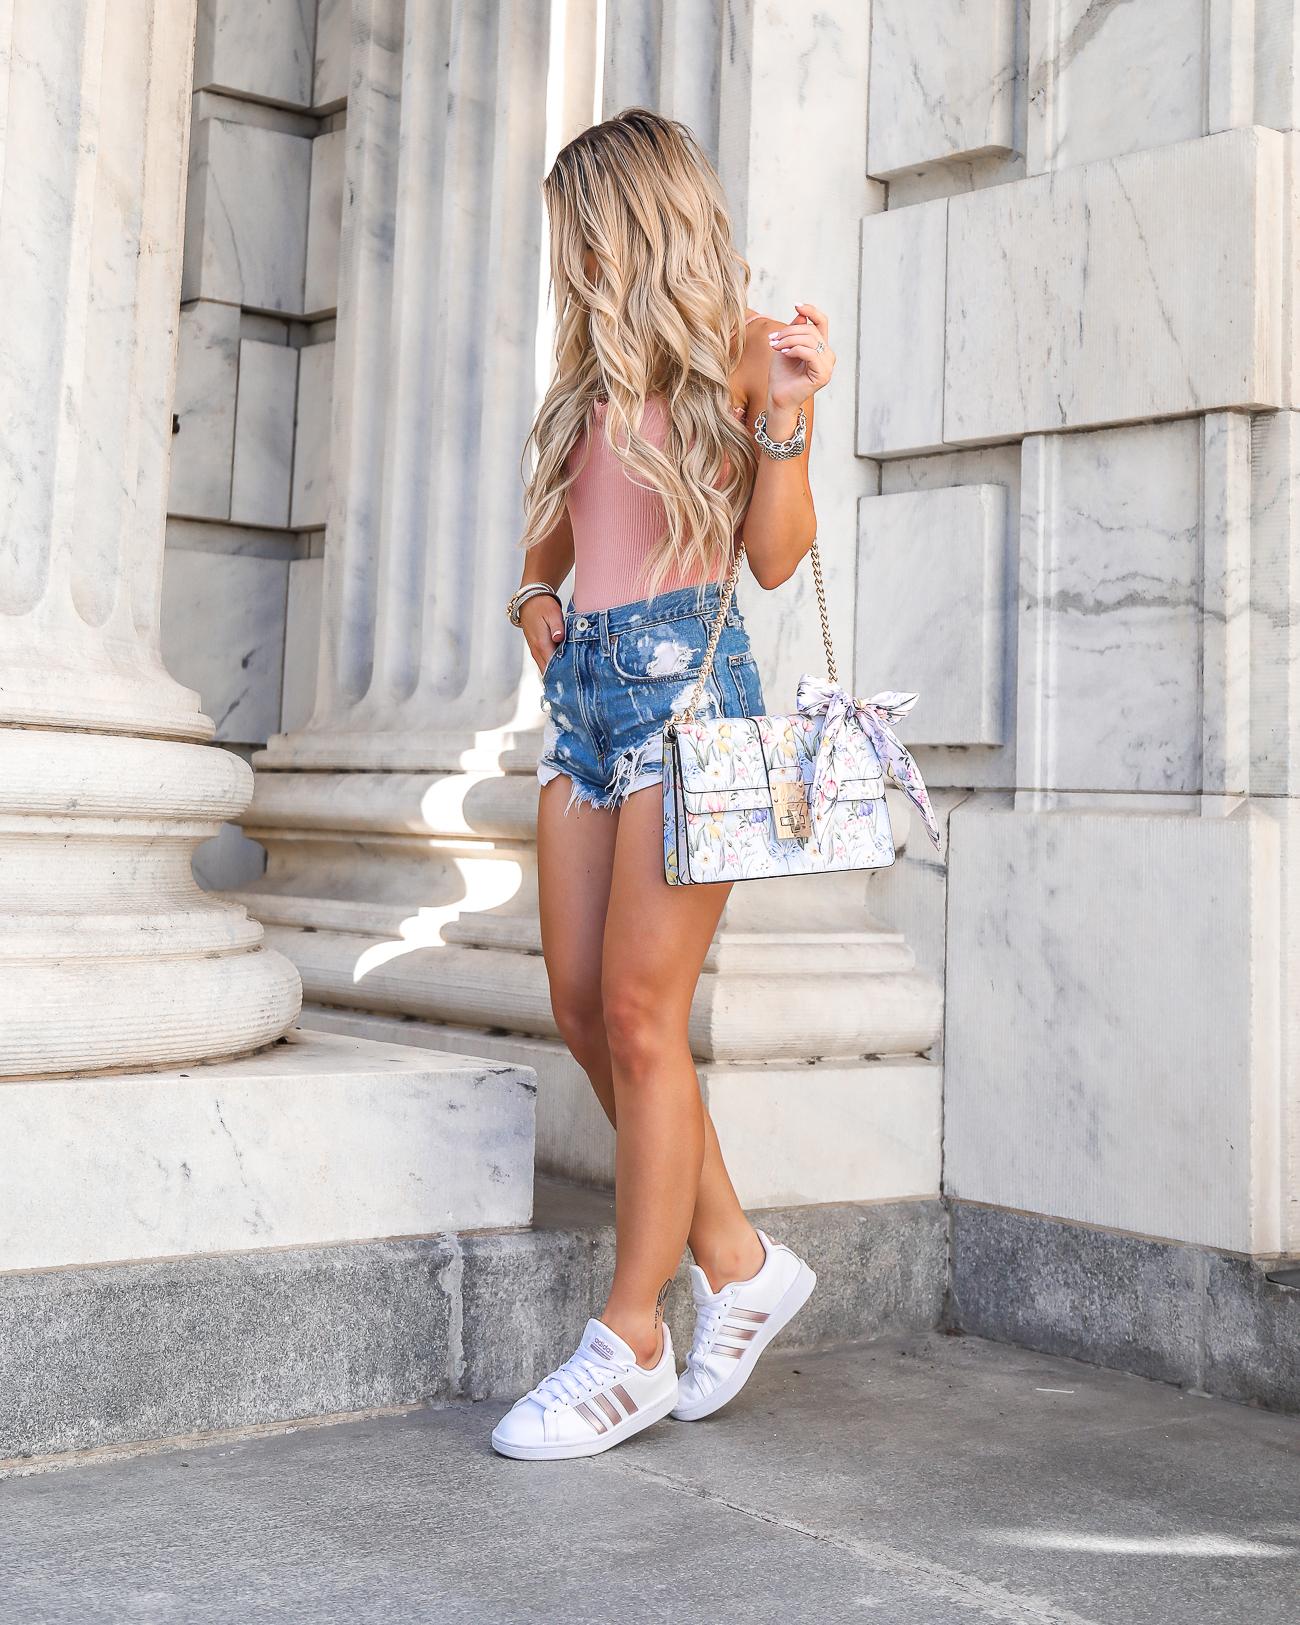 Casual Summer Outfit Rose Gold Adidas Cloudfoam Advantage Rag & Bone Justine High-Rise Distressed Denim Shorts